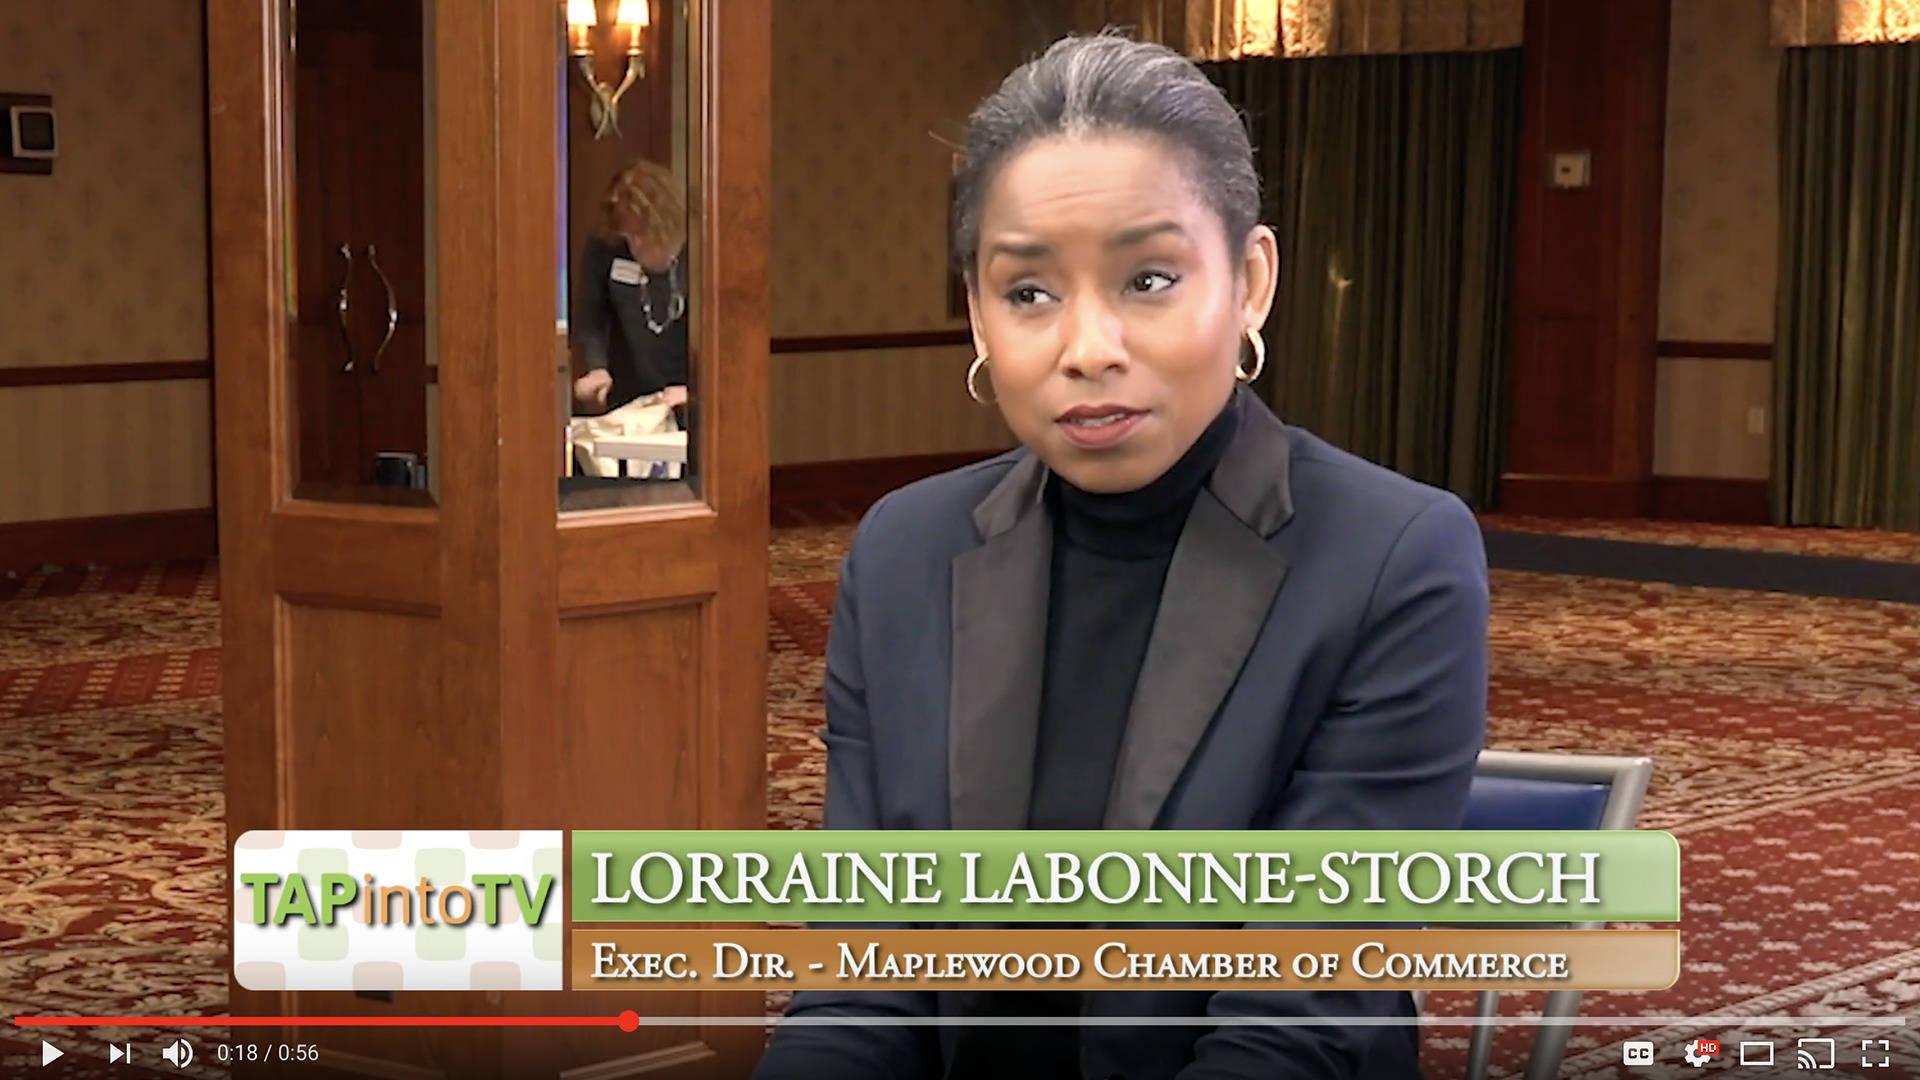 Lorraine Labonne-Storch, Maplewood Chamber E.D.